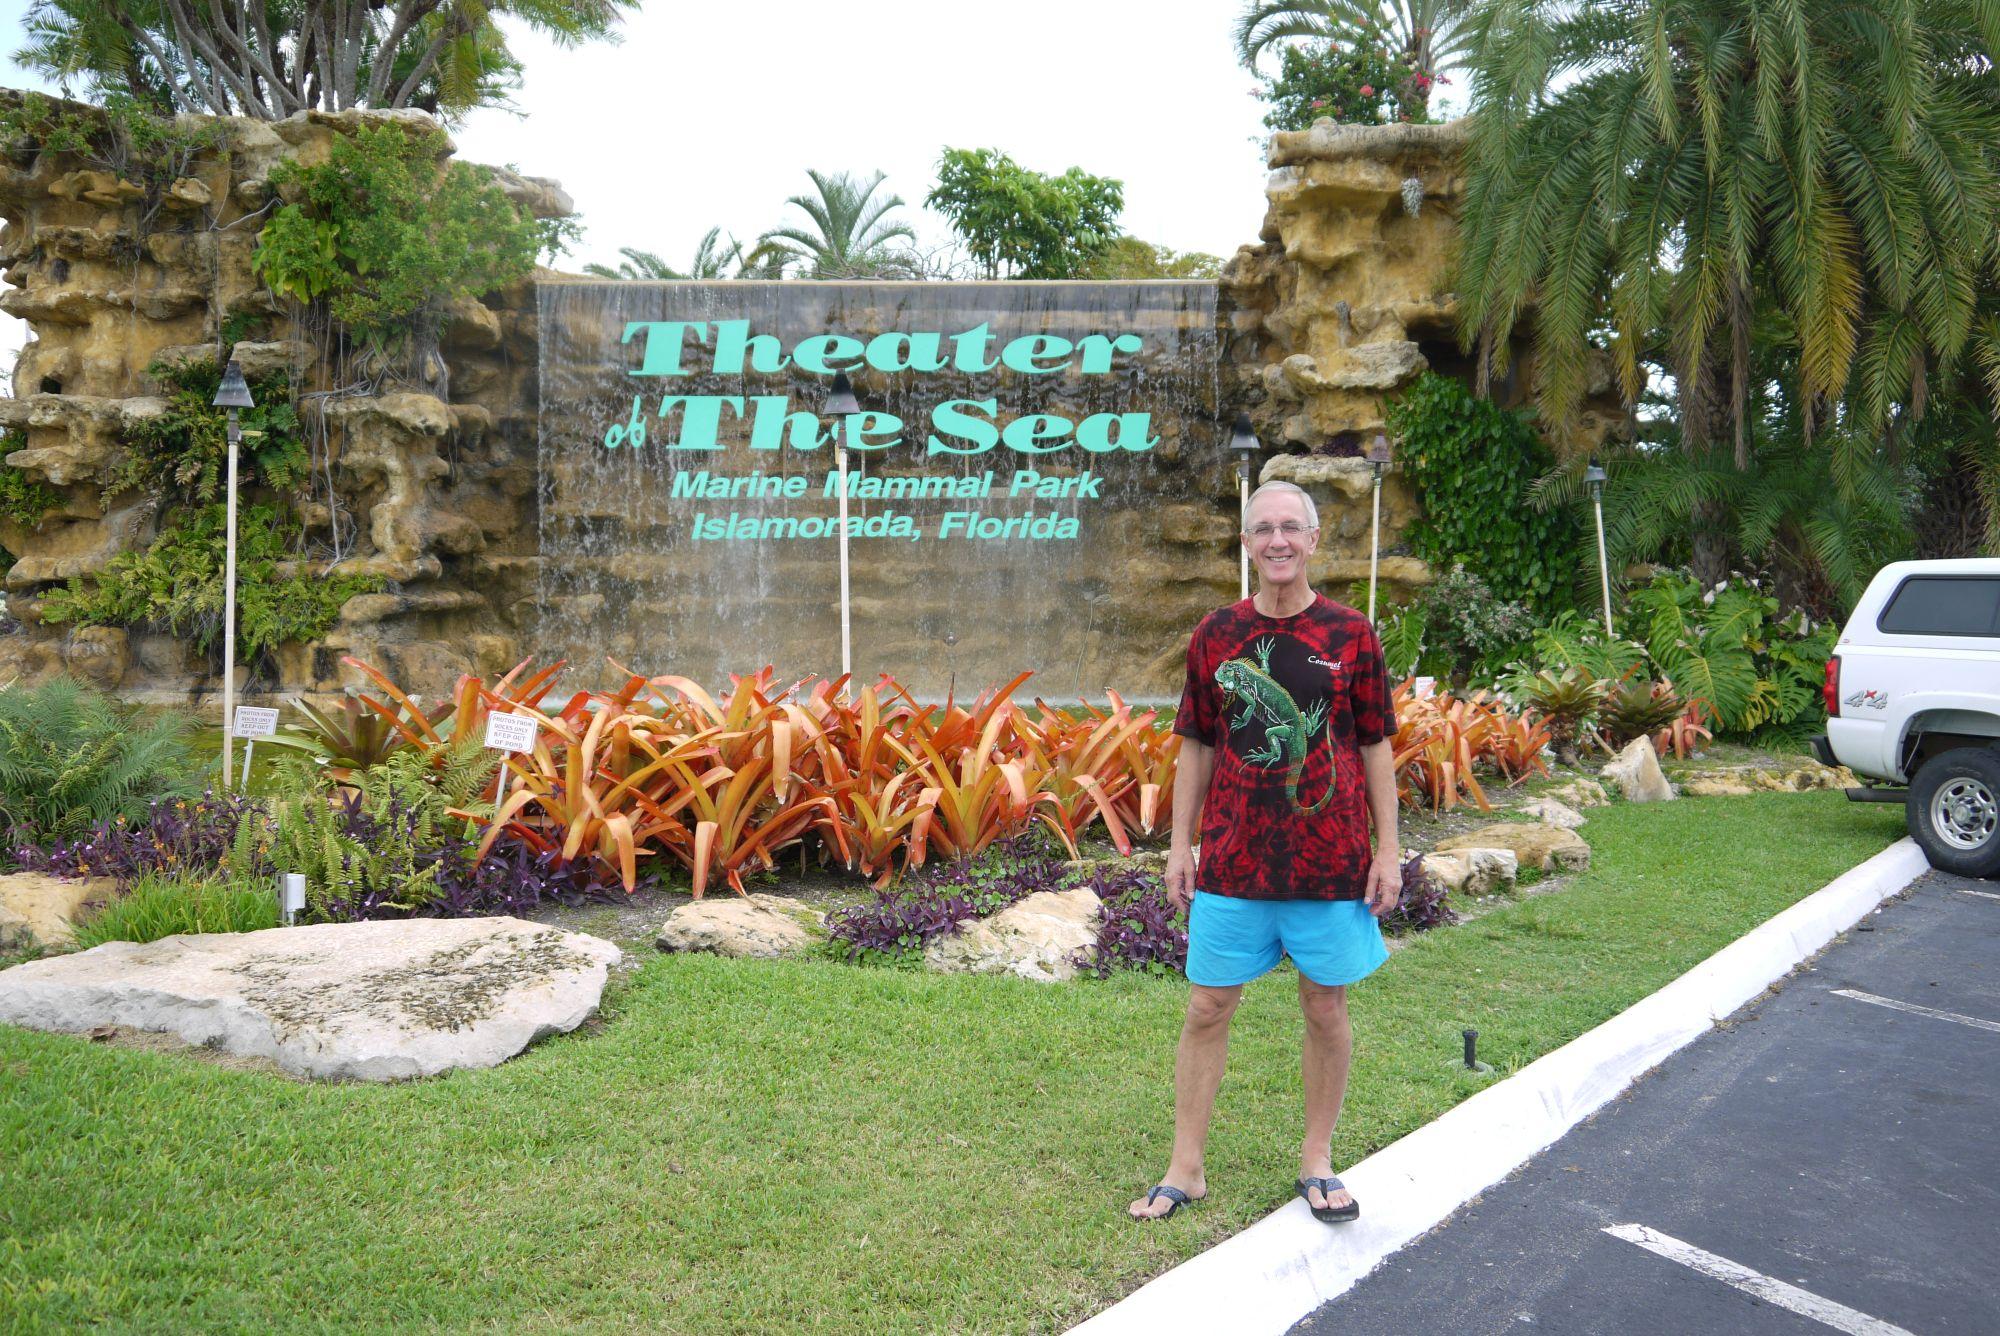 Tom vor dem Theater of the Sea, Overseas Hwy, Islamorada, FL 33036, Florida Keys